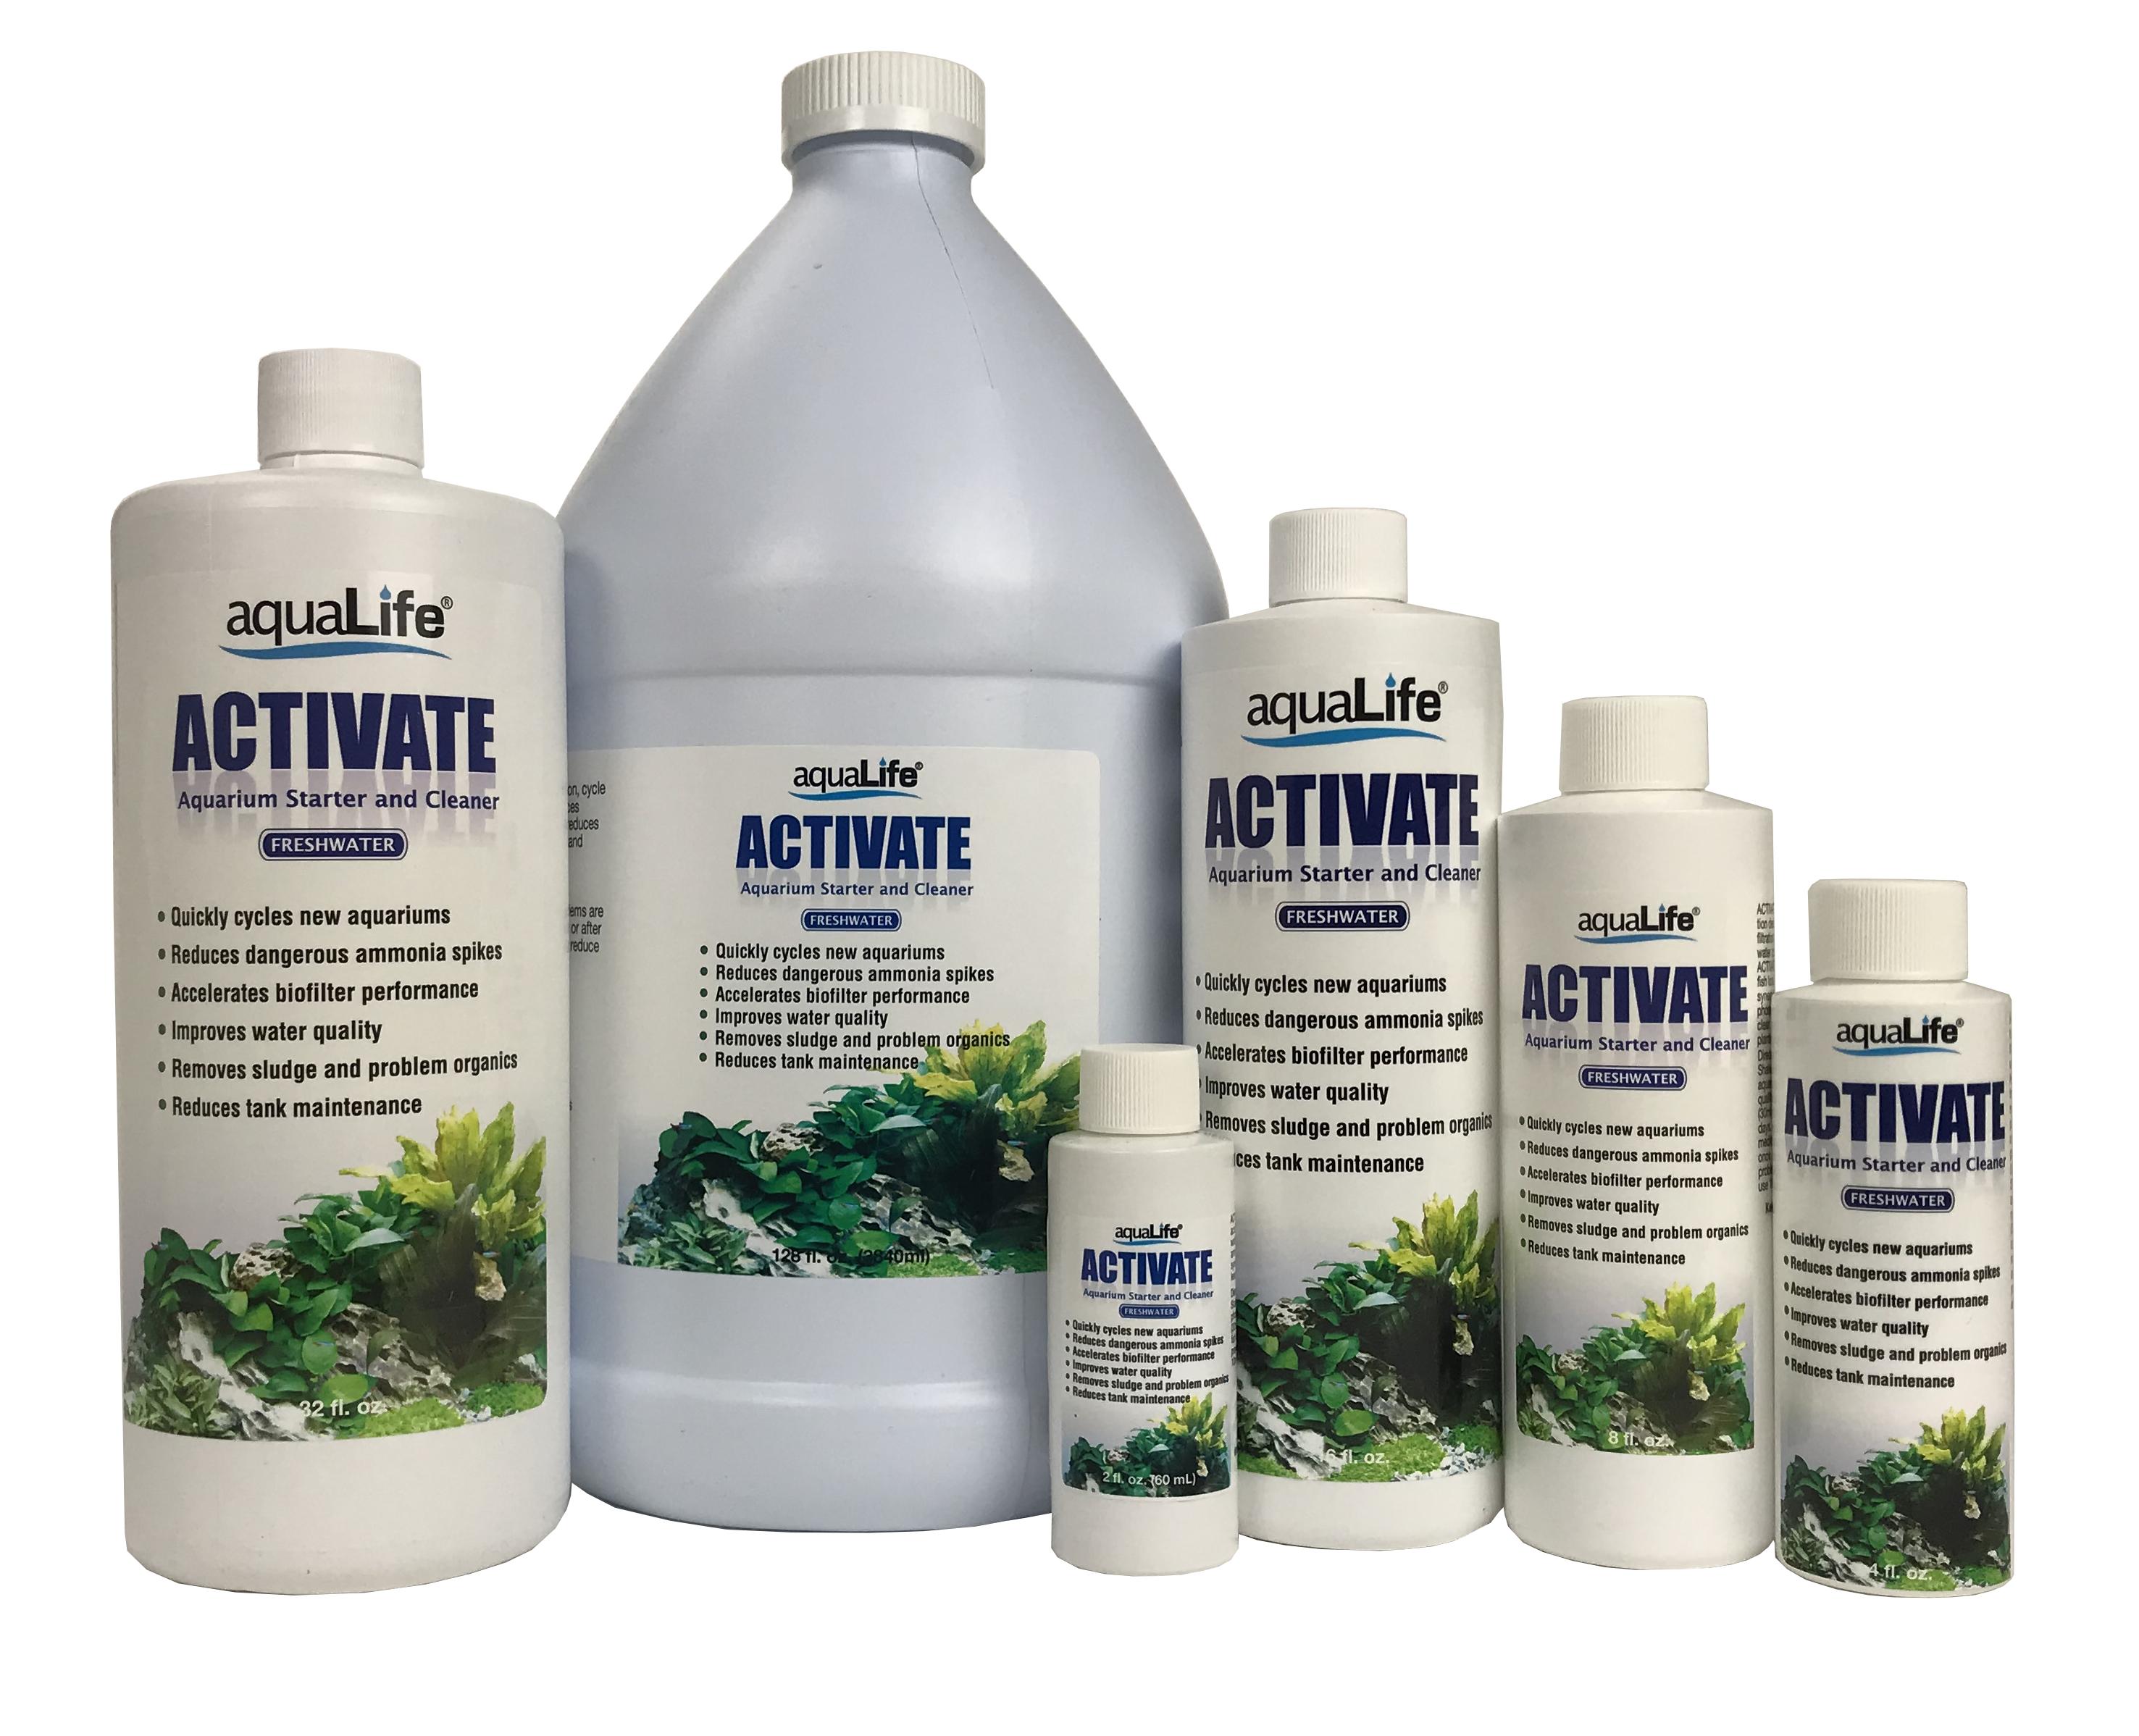 Activate Freshwater 32 oz Aquarium Starter and Cleaner